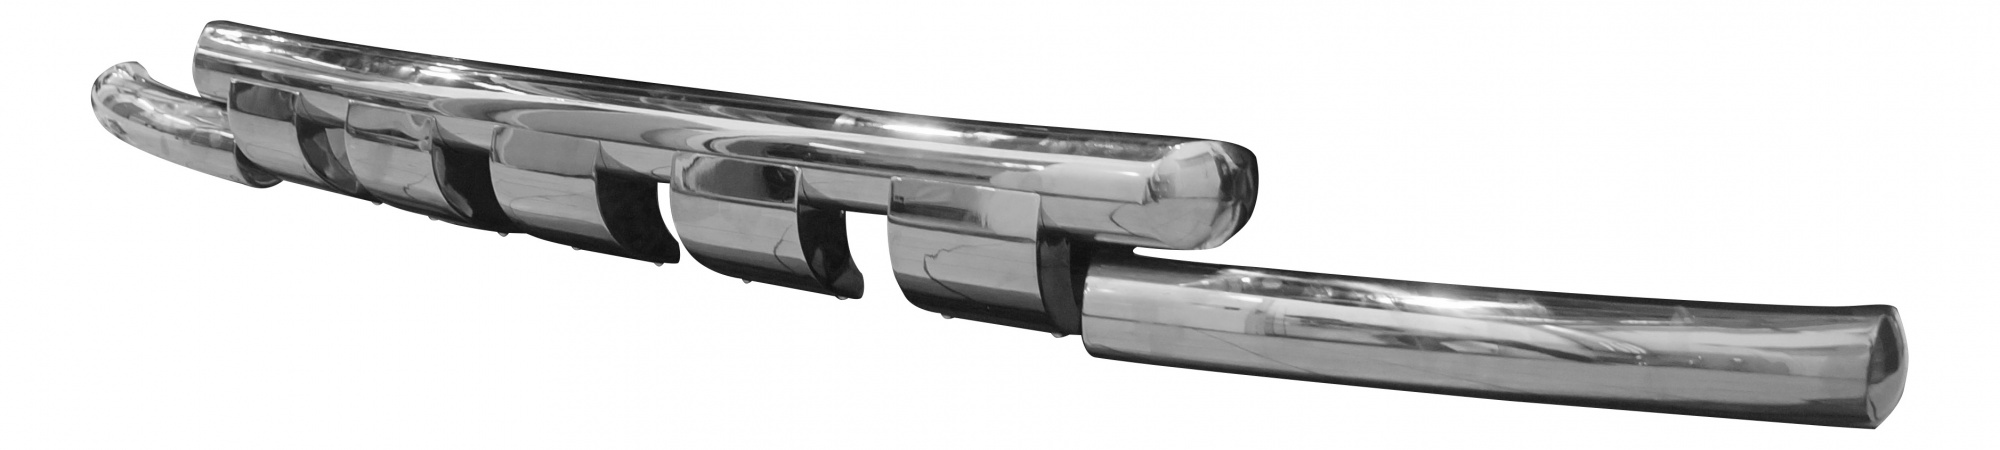 Защита переднего бампера MERCEDES X (двойная Shark) d76/76